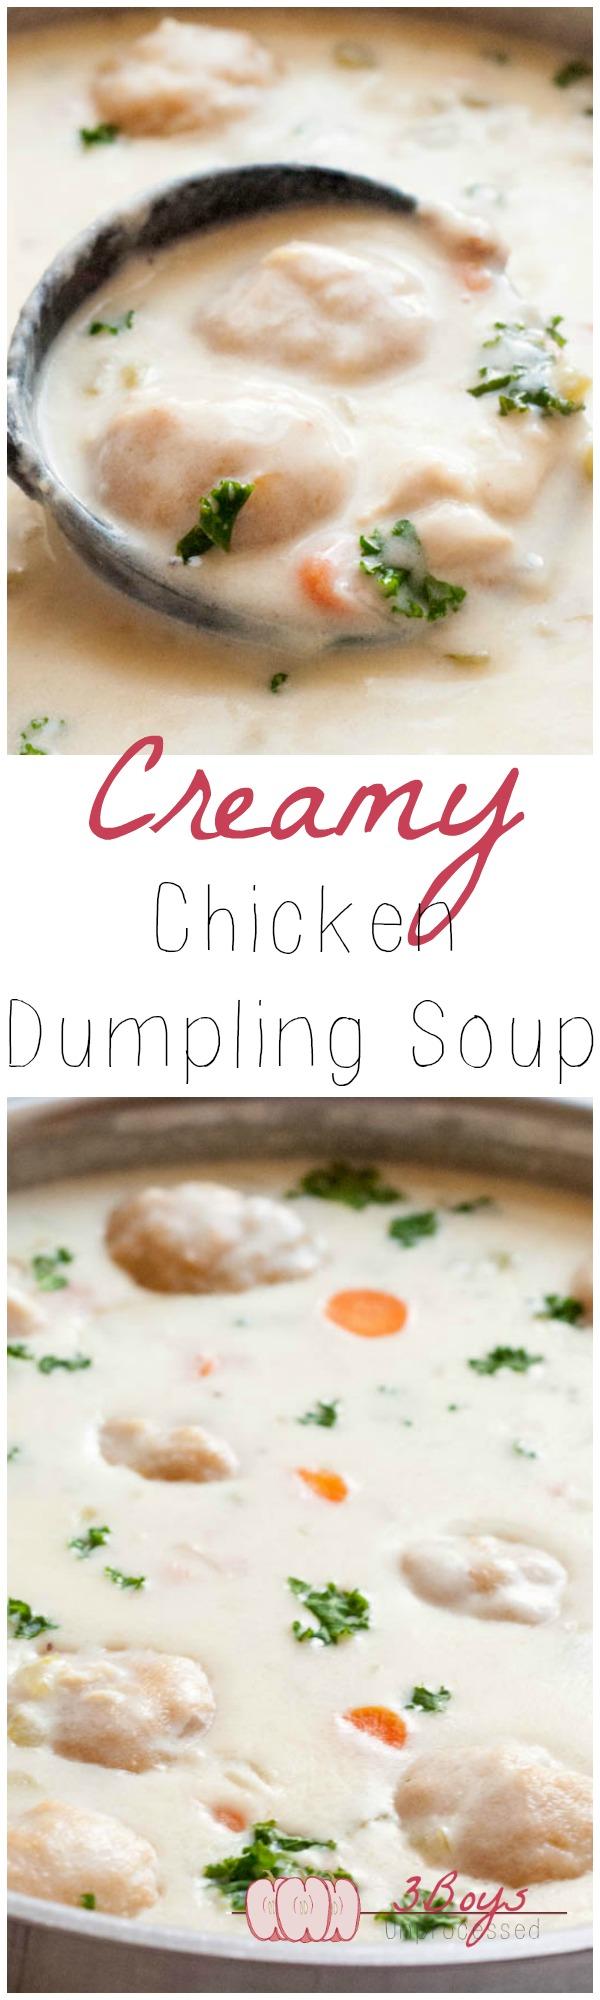 Creamy Chicken and Dumpling Soup – Pretty Little Apron